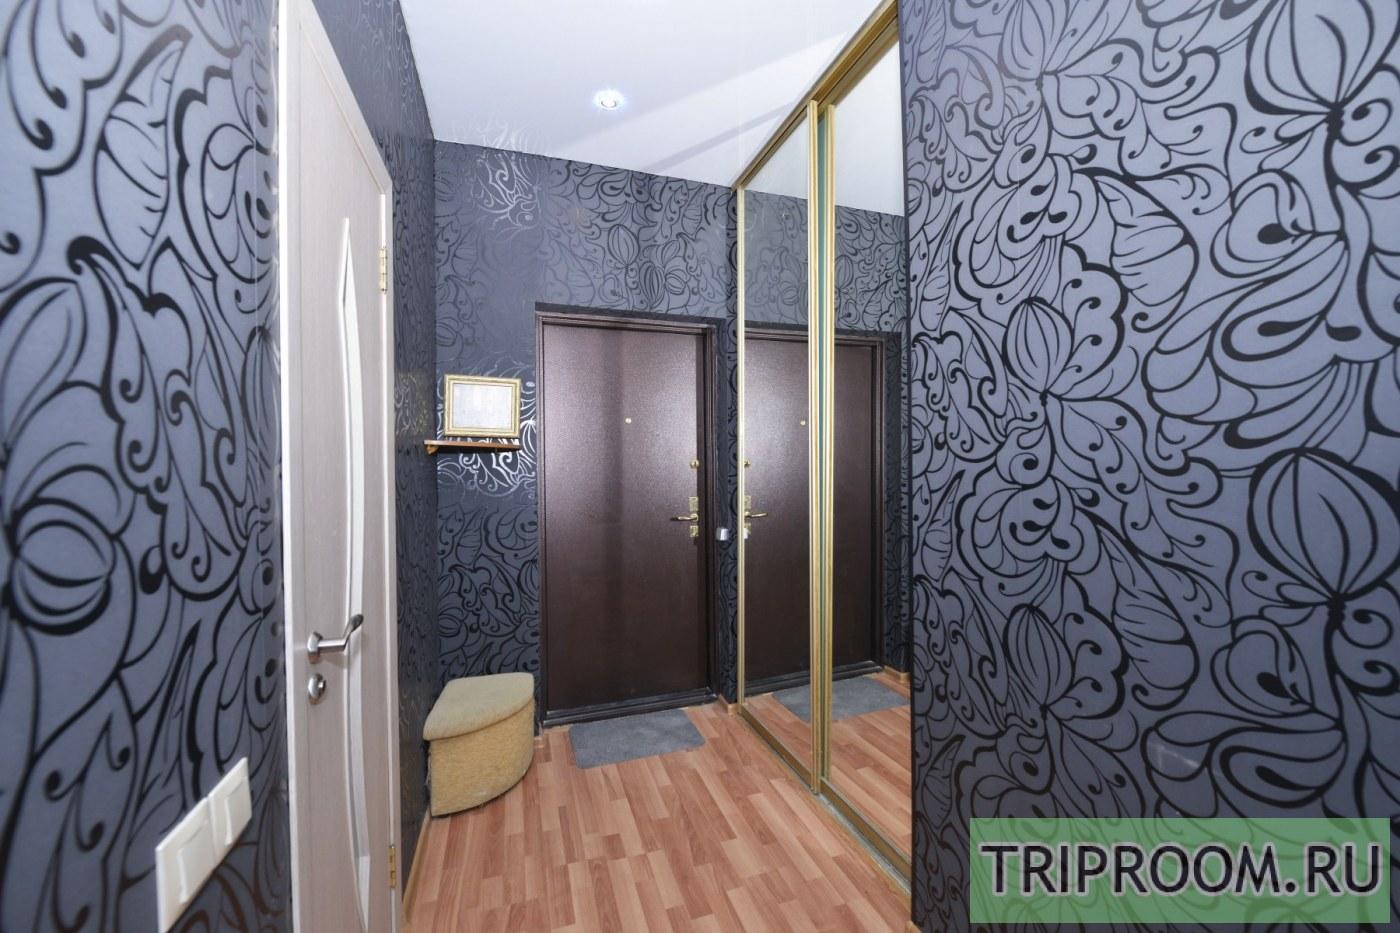 1-комнатная квартира посуточно (вариант № 40607), ул. Галущака улица, фото № 11